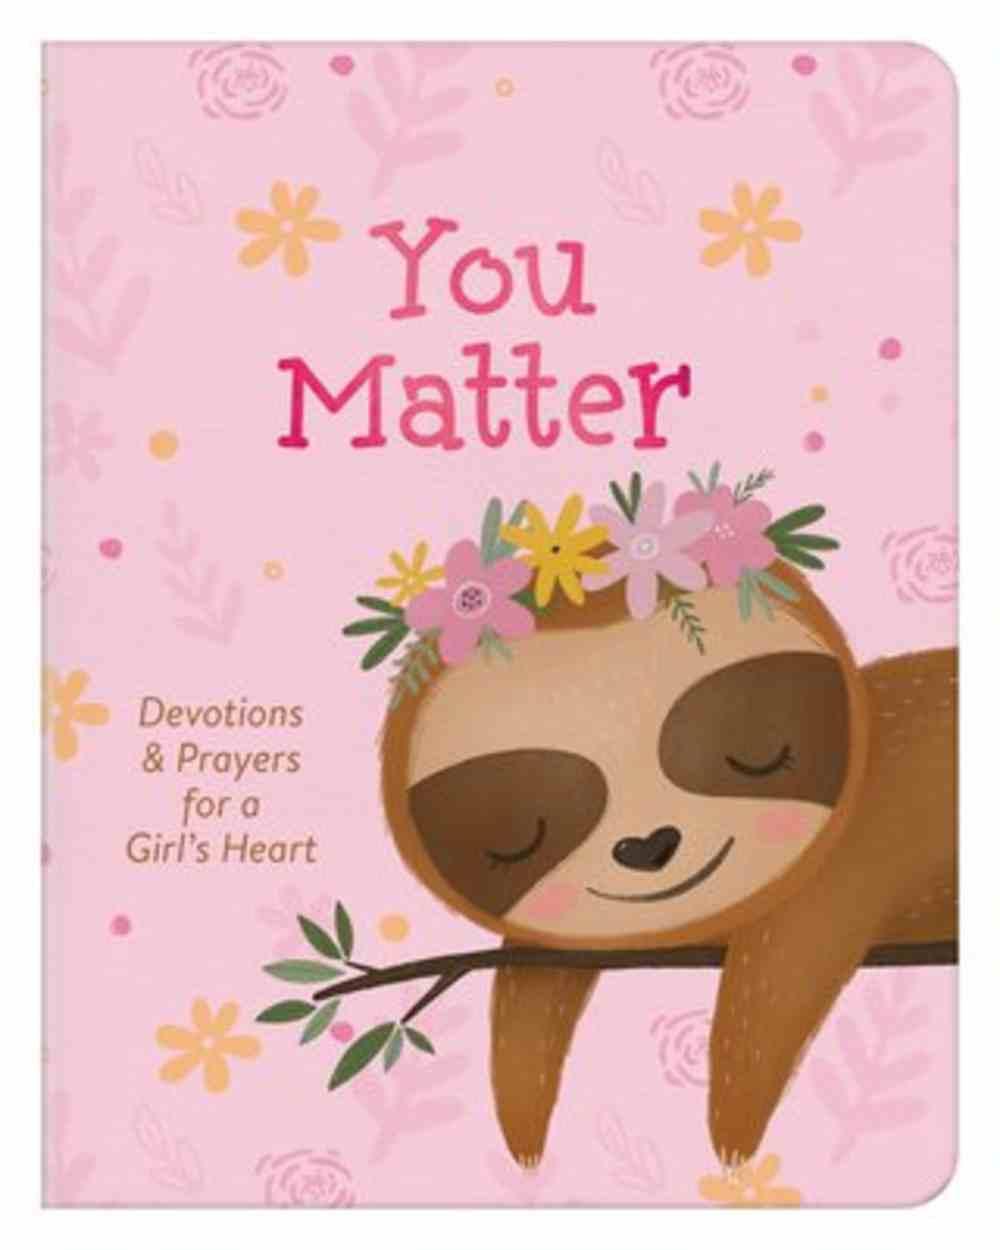 You Matter: Devotions & Prayers For a Girl's Heart (For Girls) Paperback